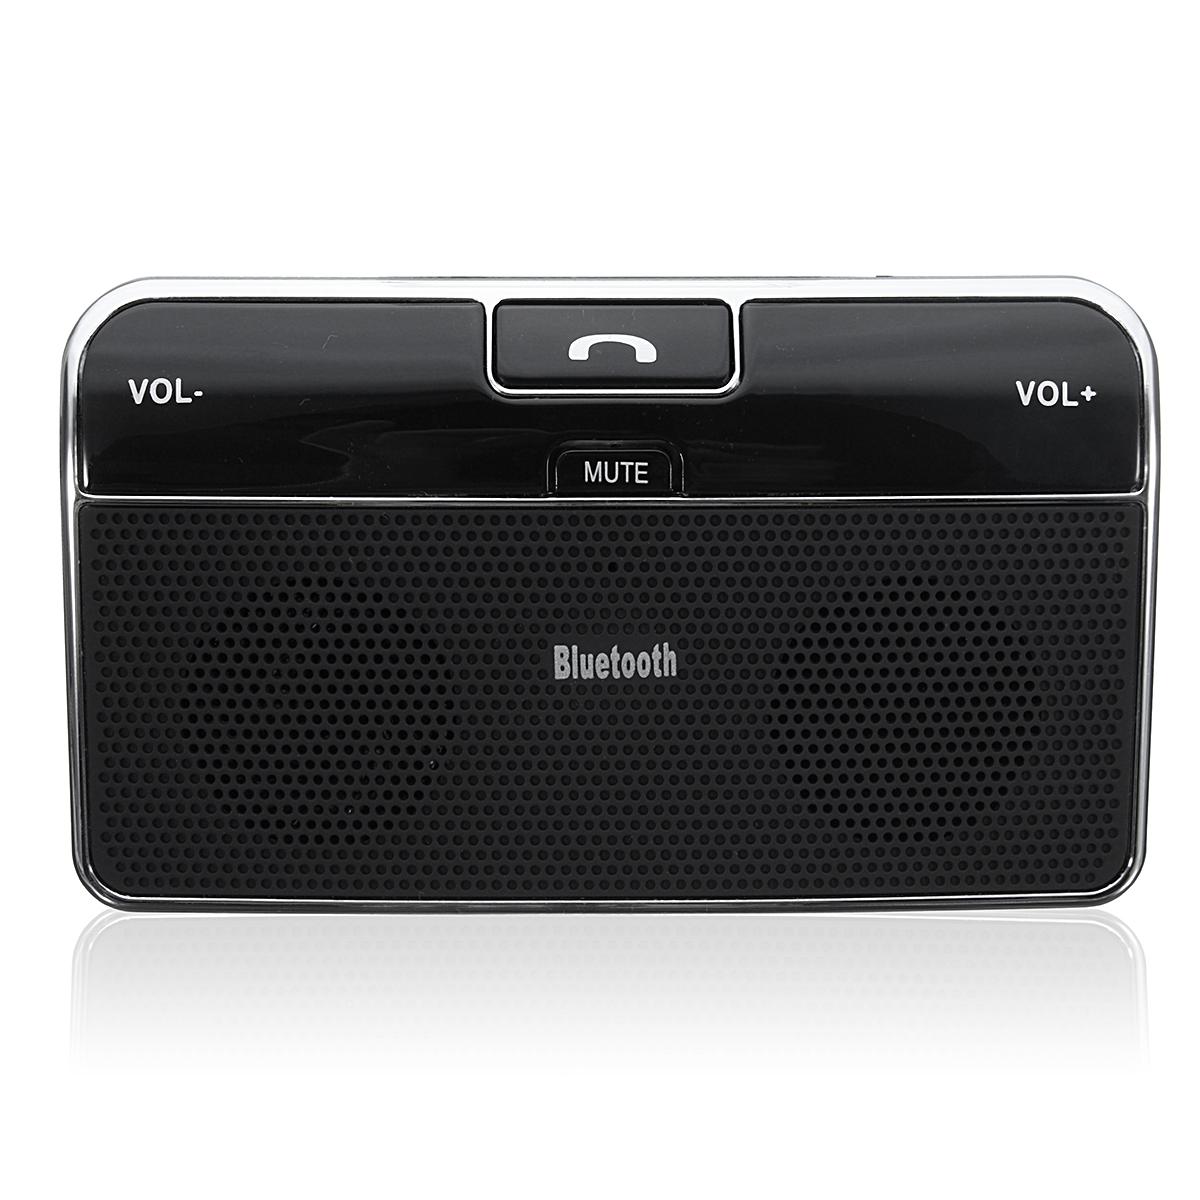 Silm Wireless Bluetooth Handsfree Speaker Phone MP3 Car